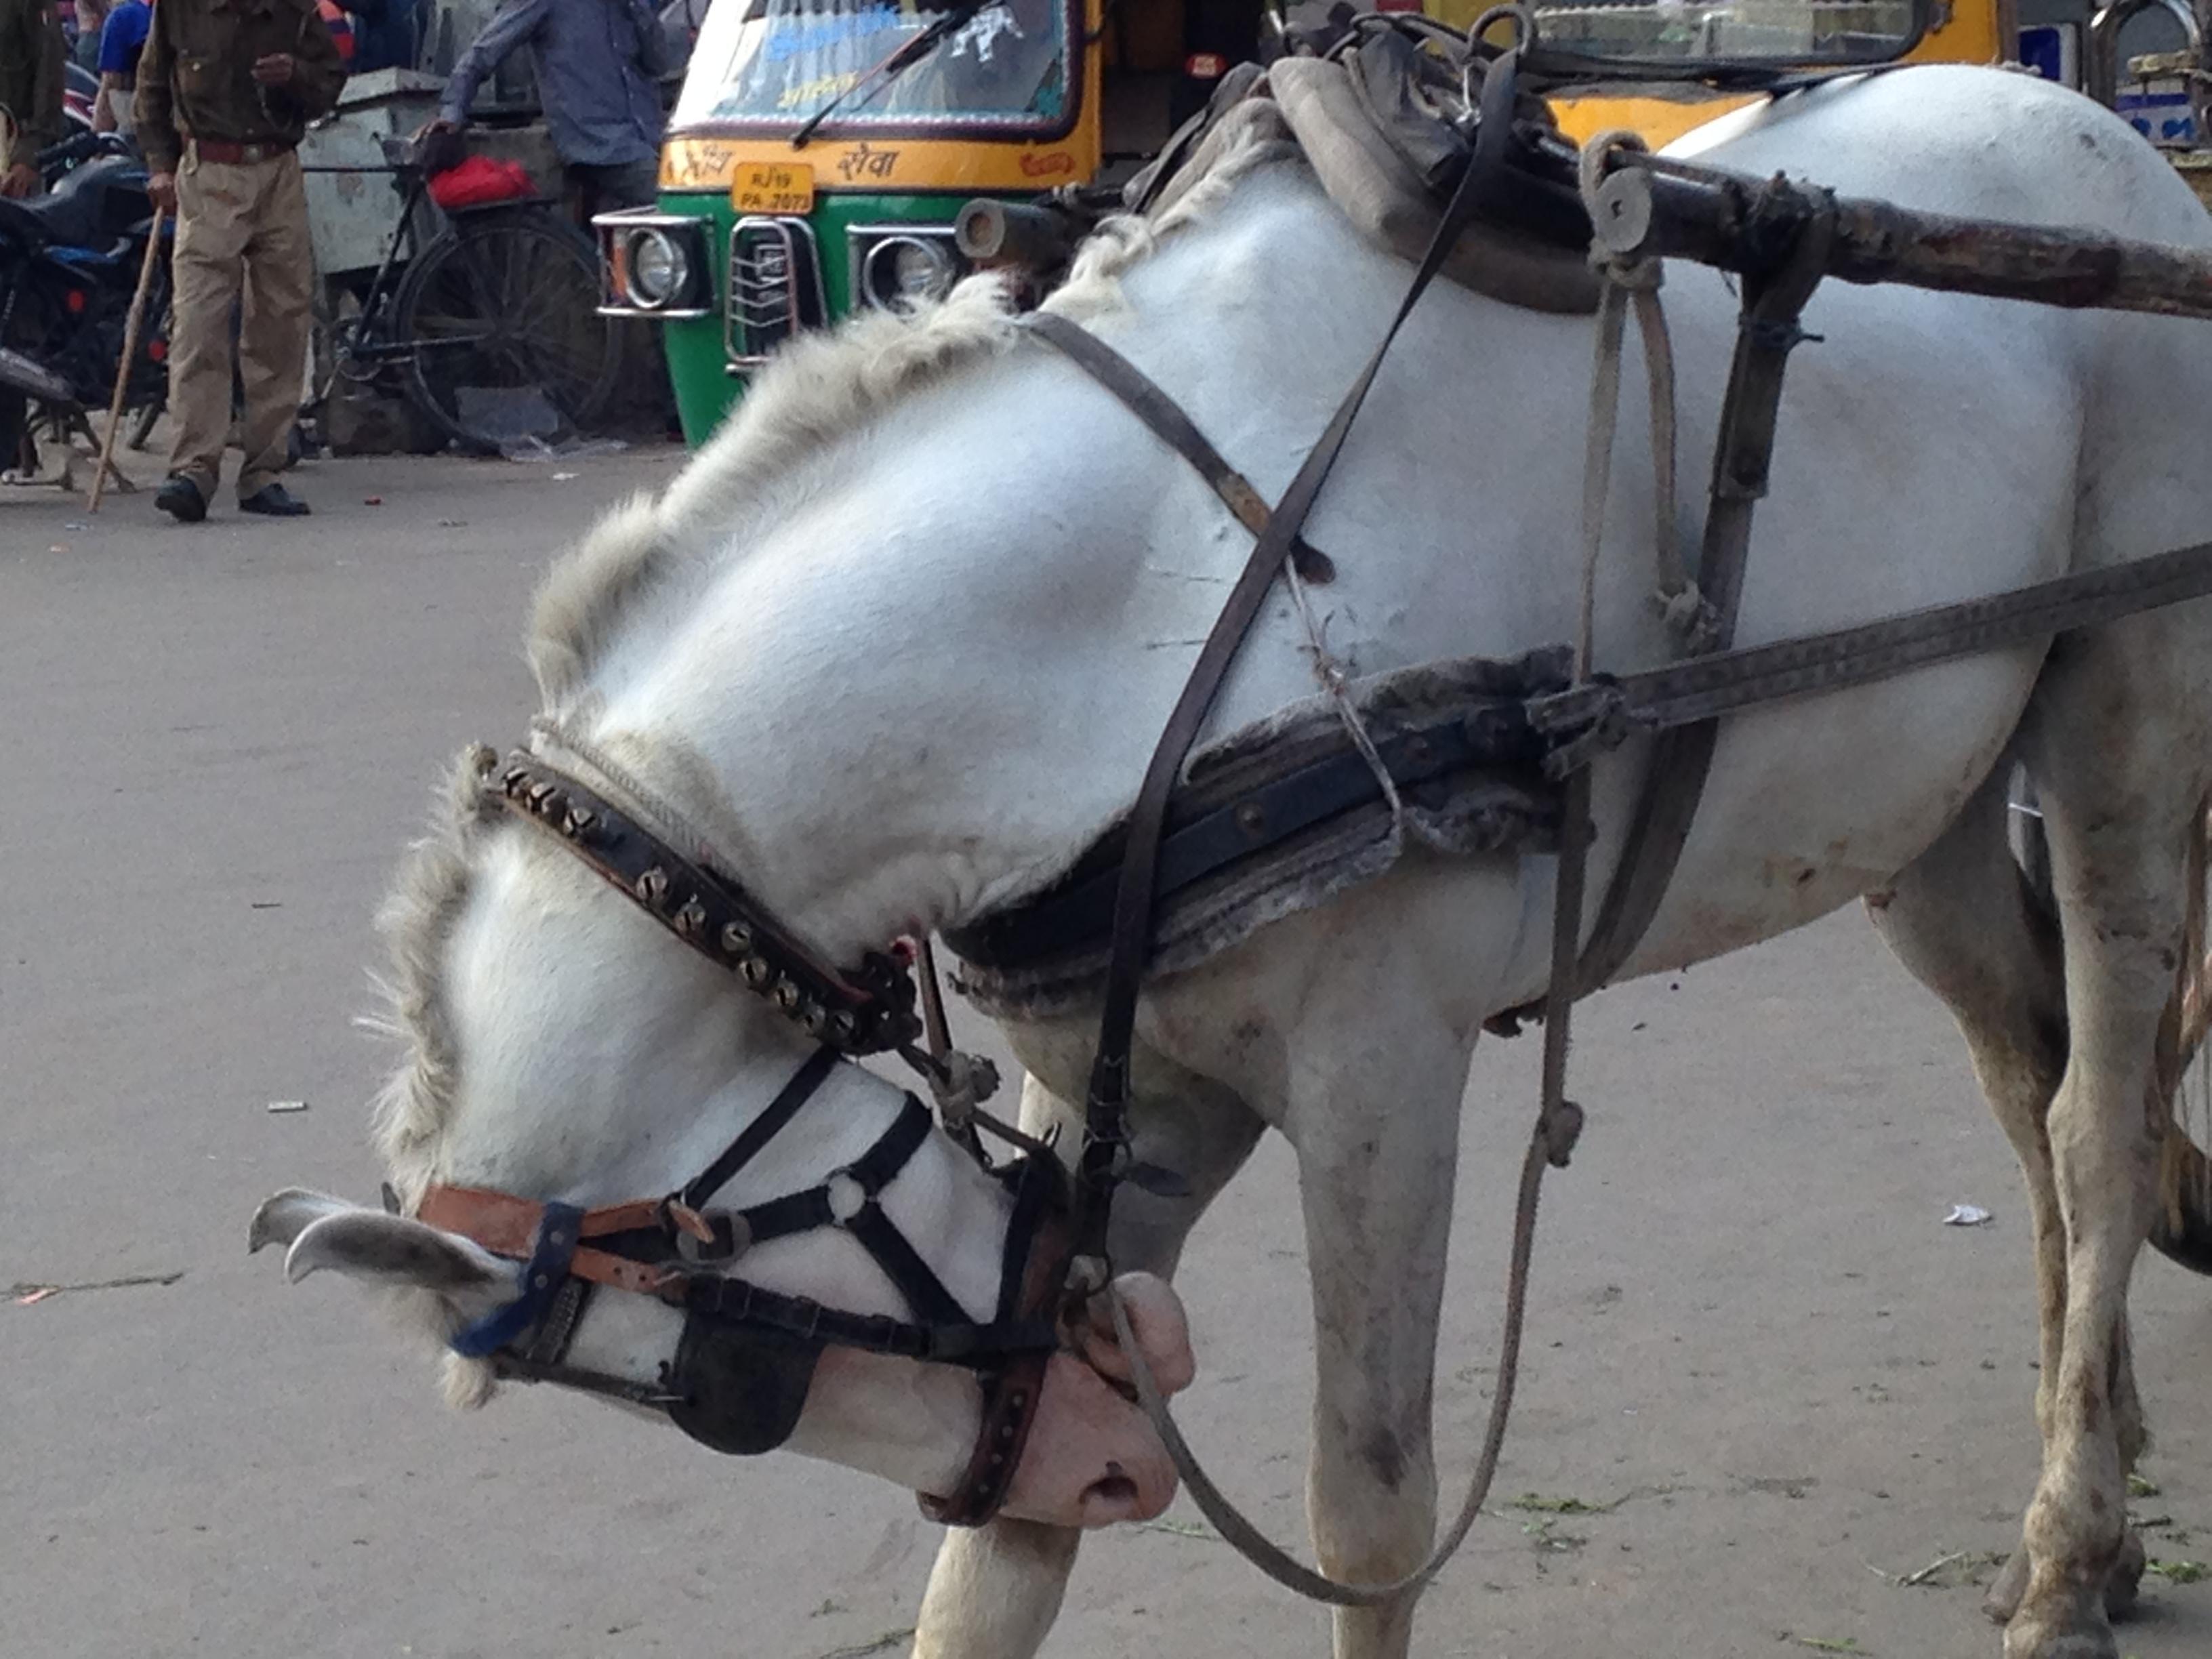 The Same Marwari Horse Scratching His Foreleg